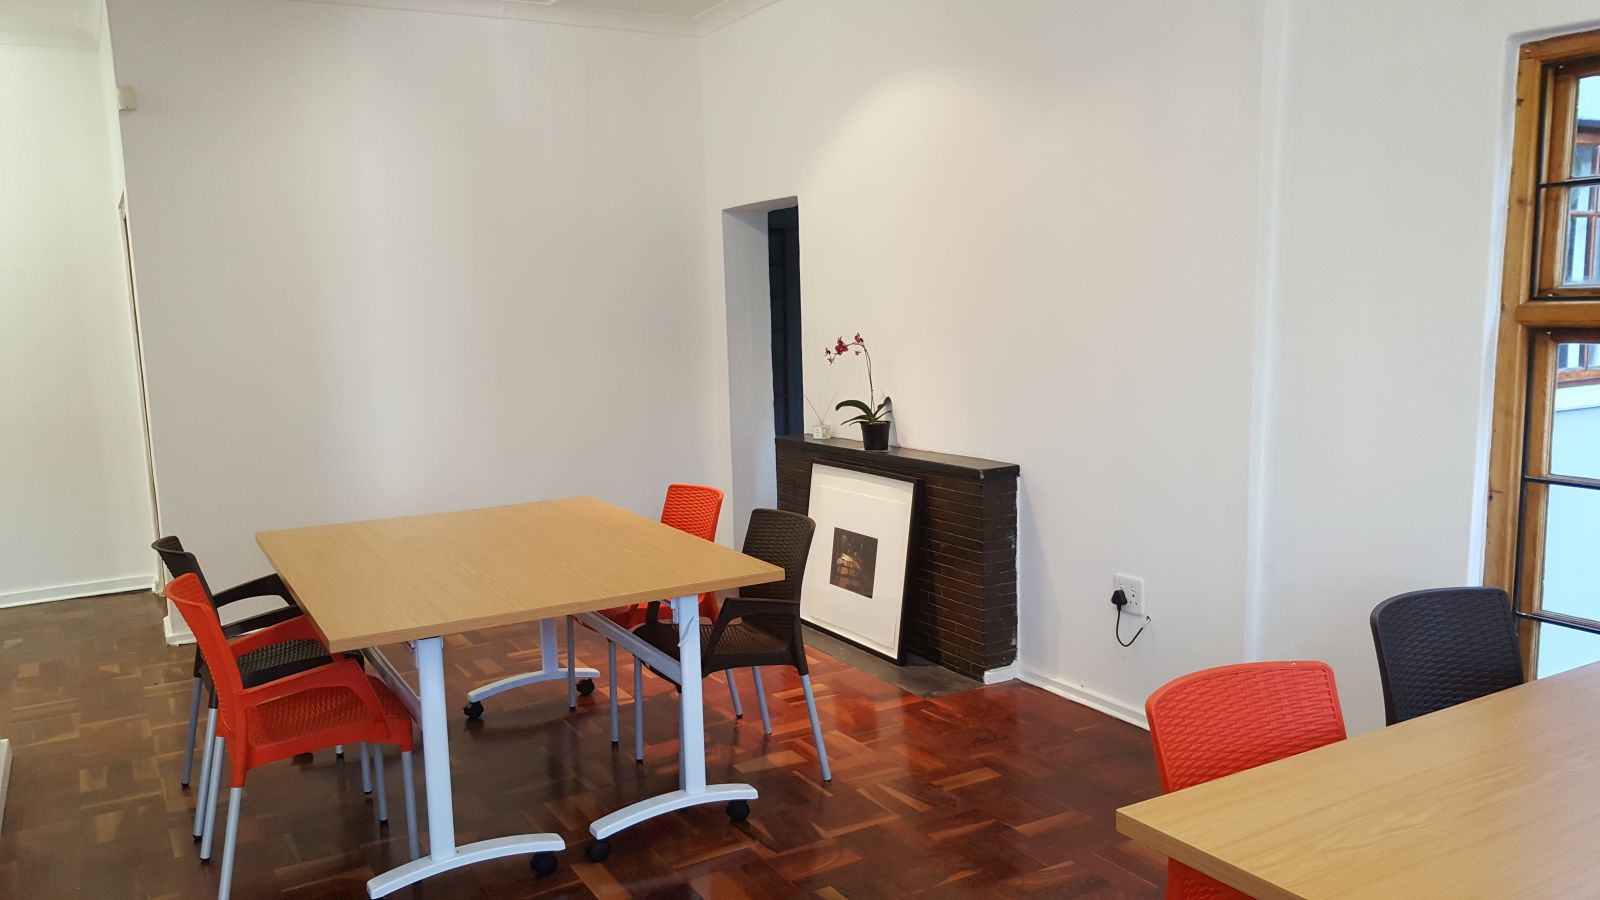 Mzansipreneur Reading Room, Johannesburg